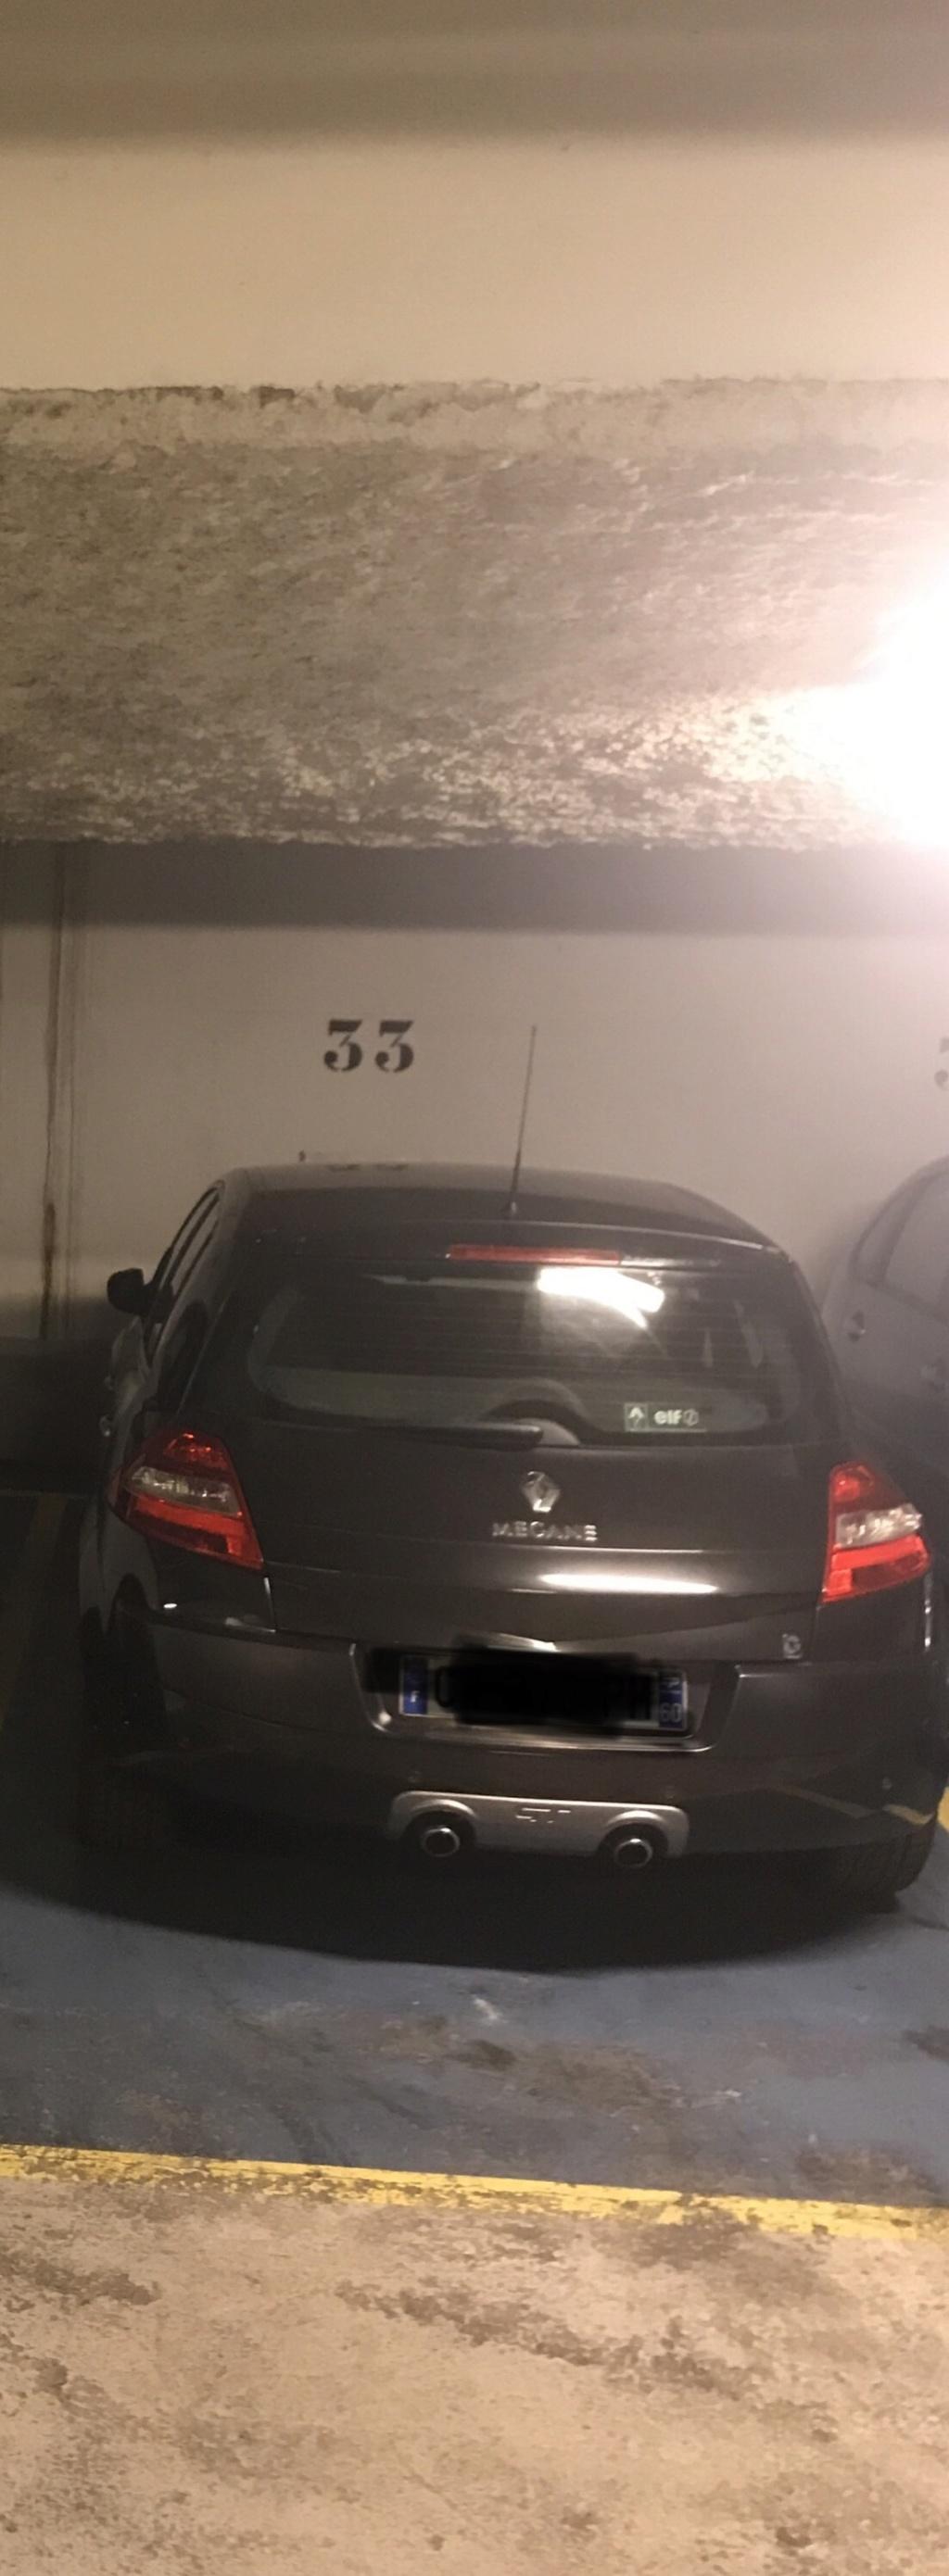 [Charly 60] Mégane II.2 GT 2.0 Dci 150 Ee227210